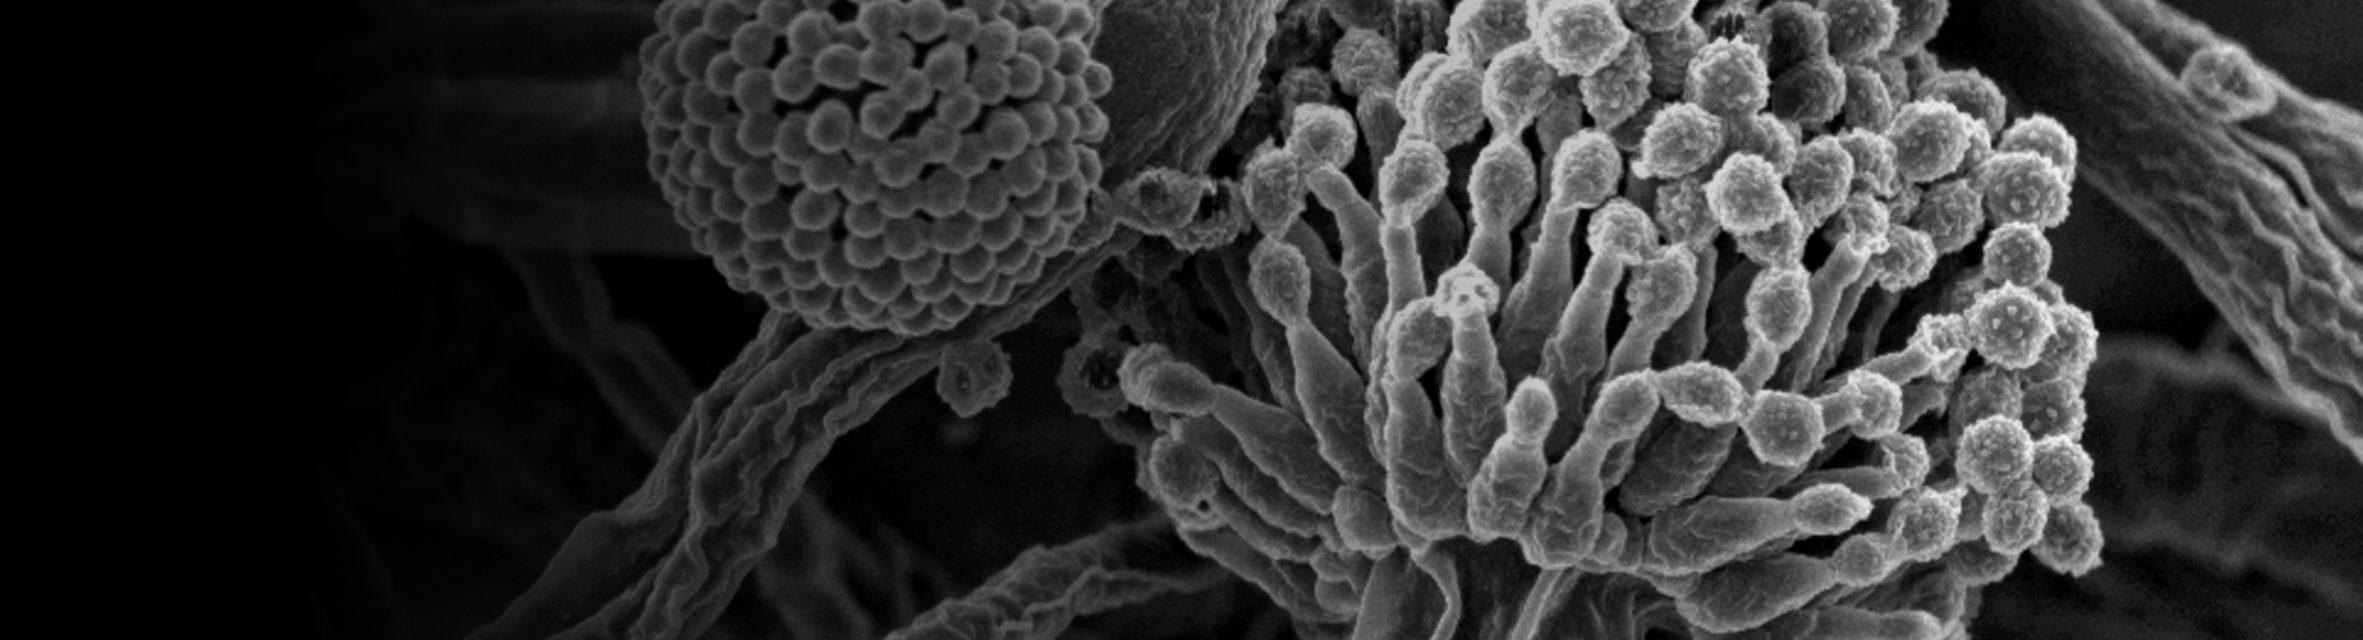 Fungus Resistance Testing